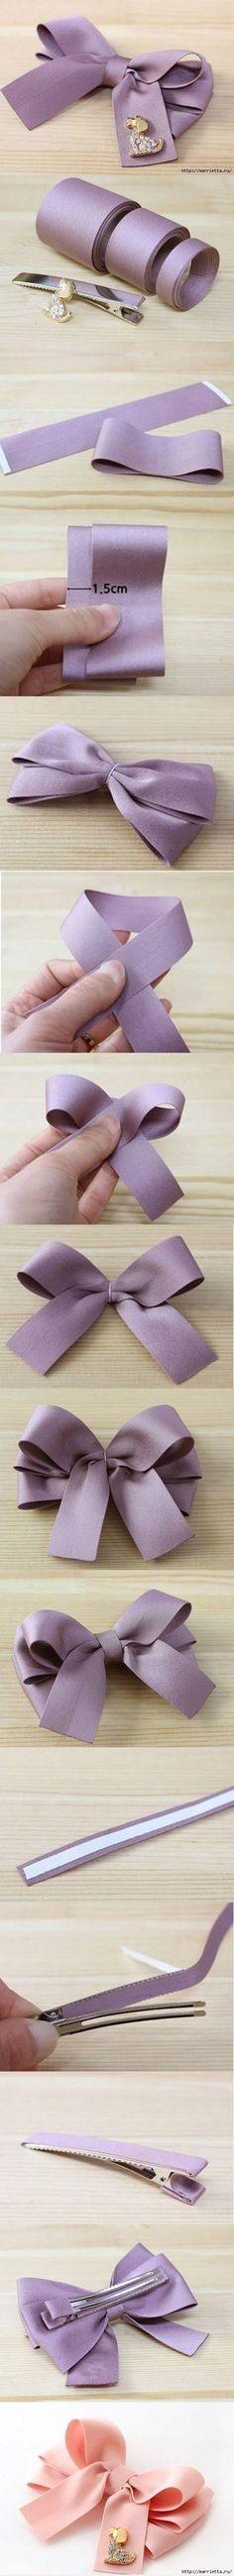 DIY Simple Bow Hairpin DIY Projects   UsefulDIY.com Follow Us on Facebook ==> http://www.facebook.com/UsefulDiy